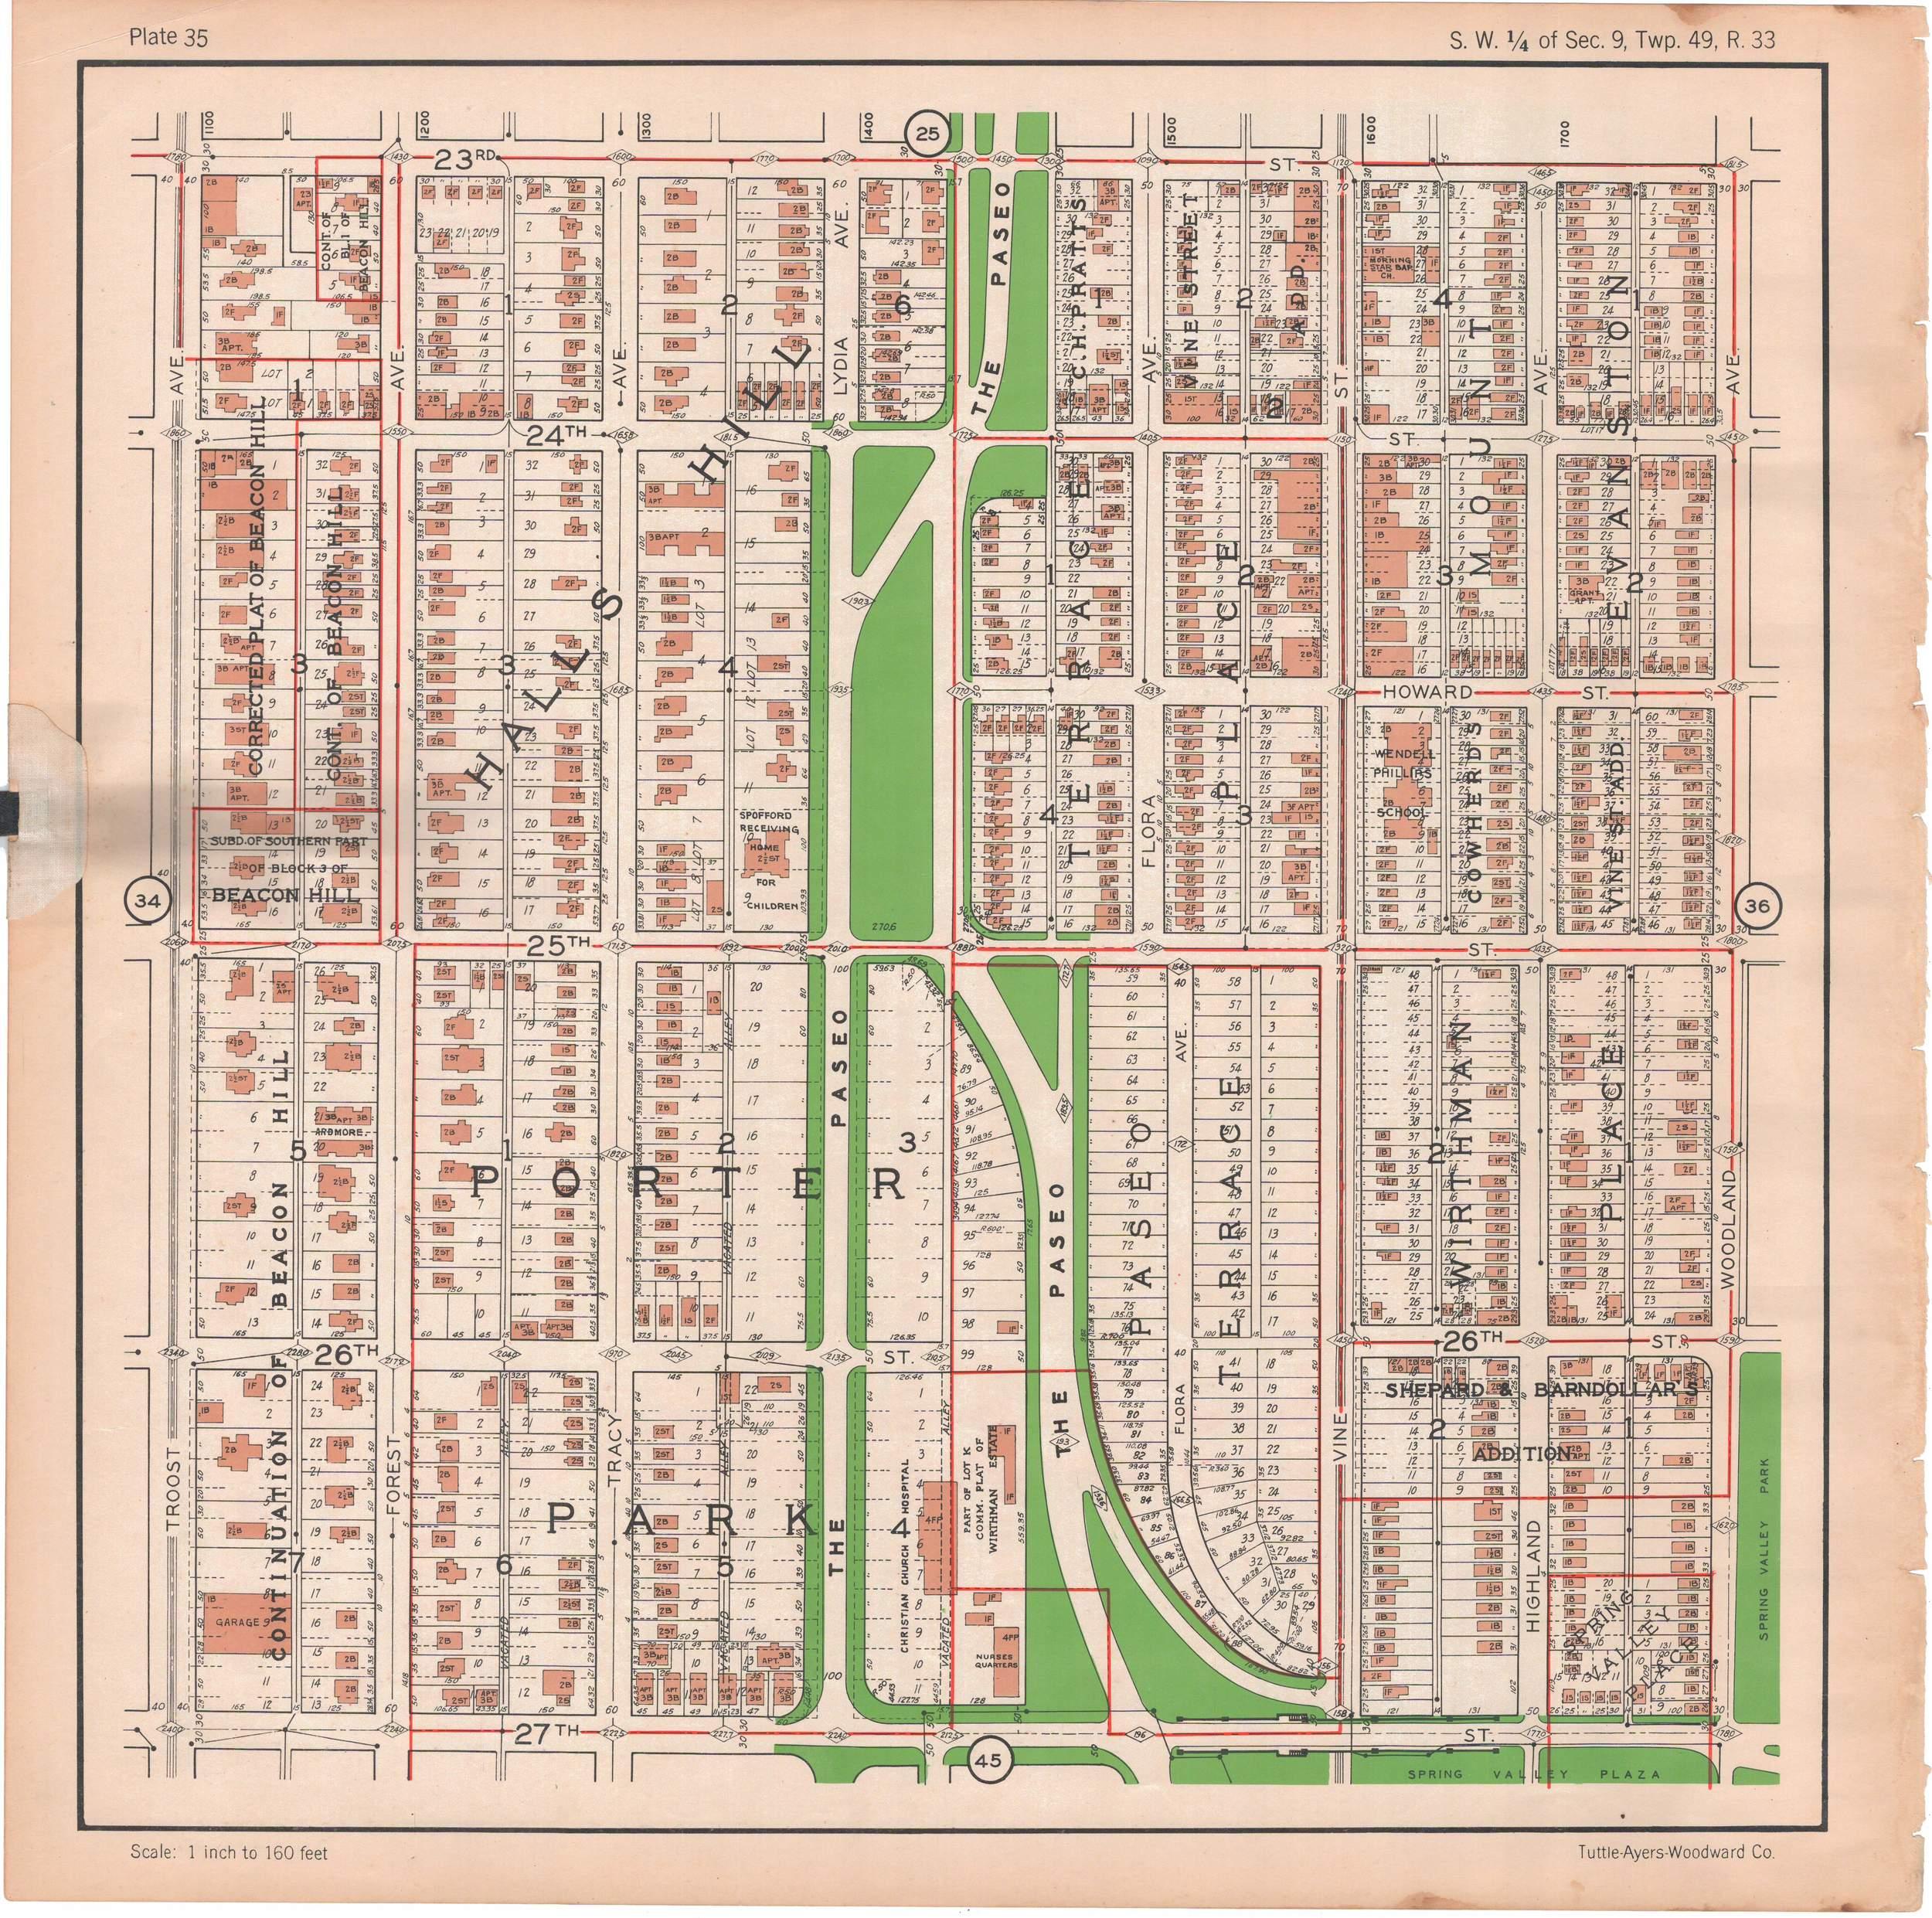 1925 TUTTLE_AYERS_Plate 35.JPG